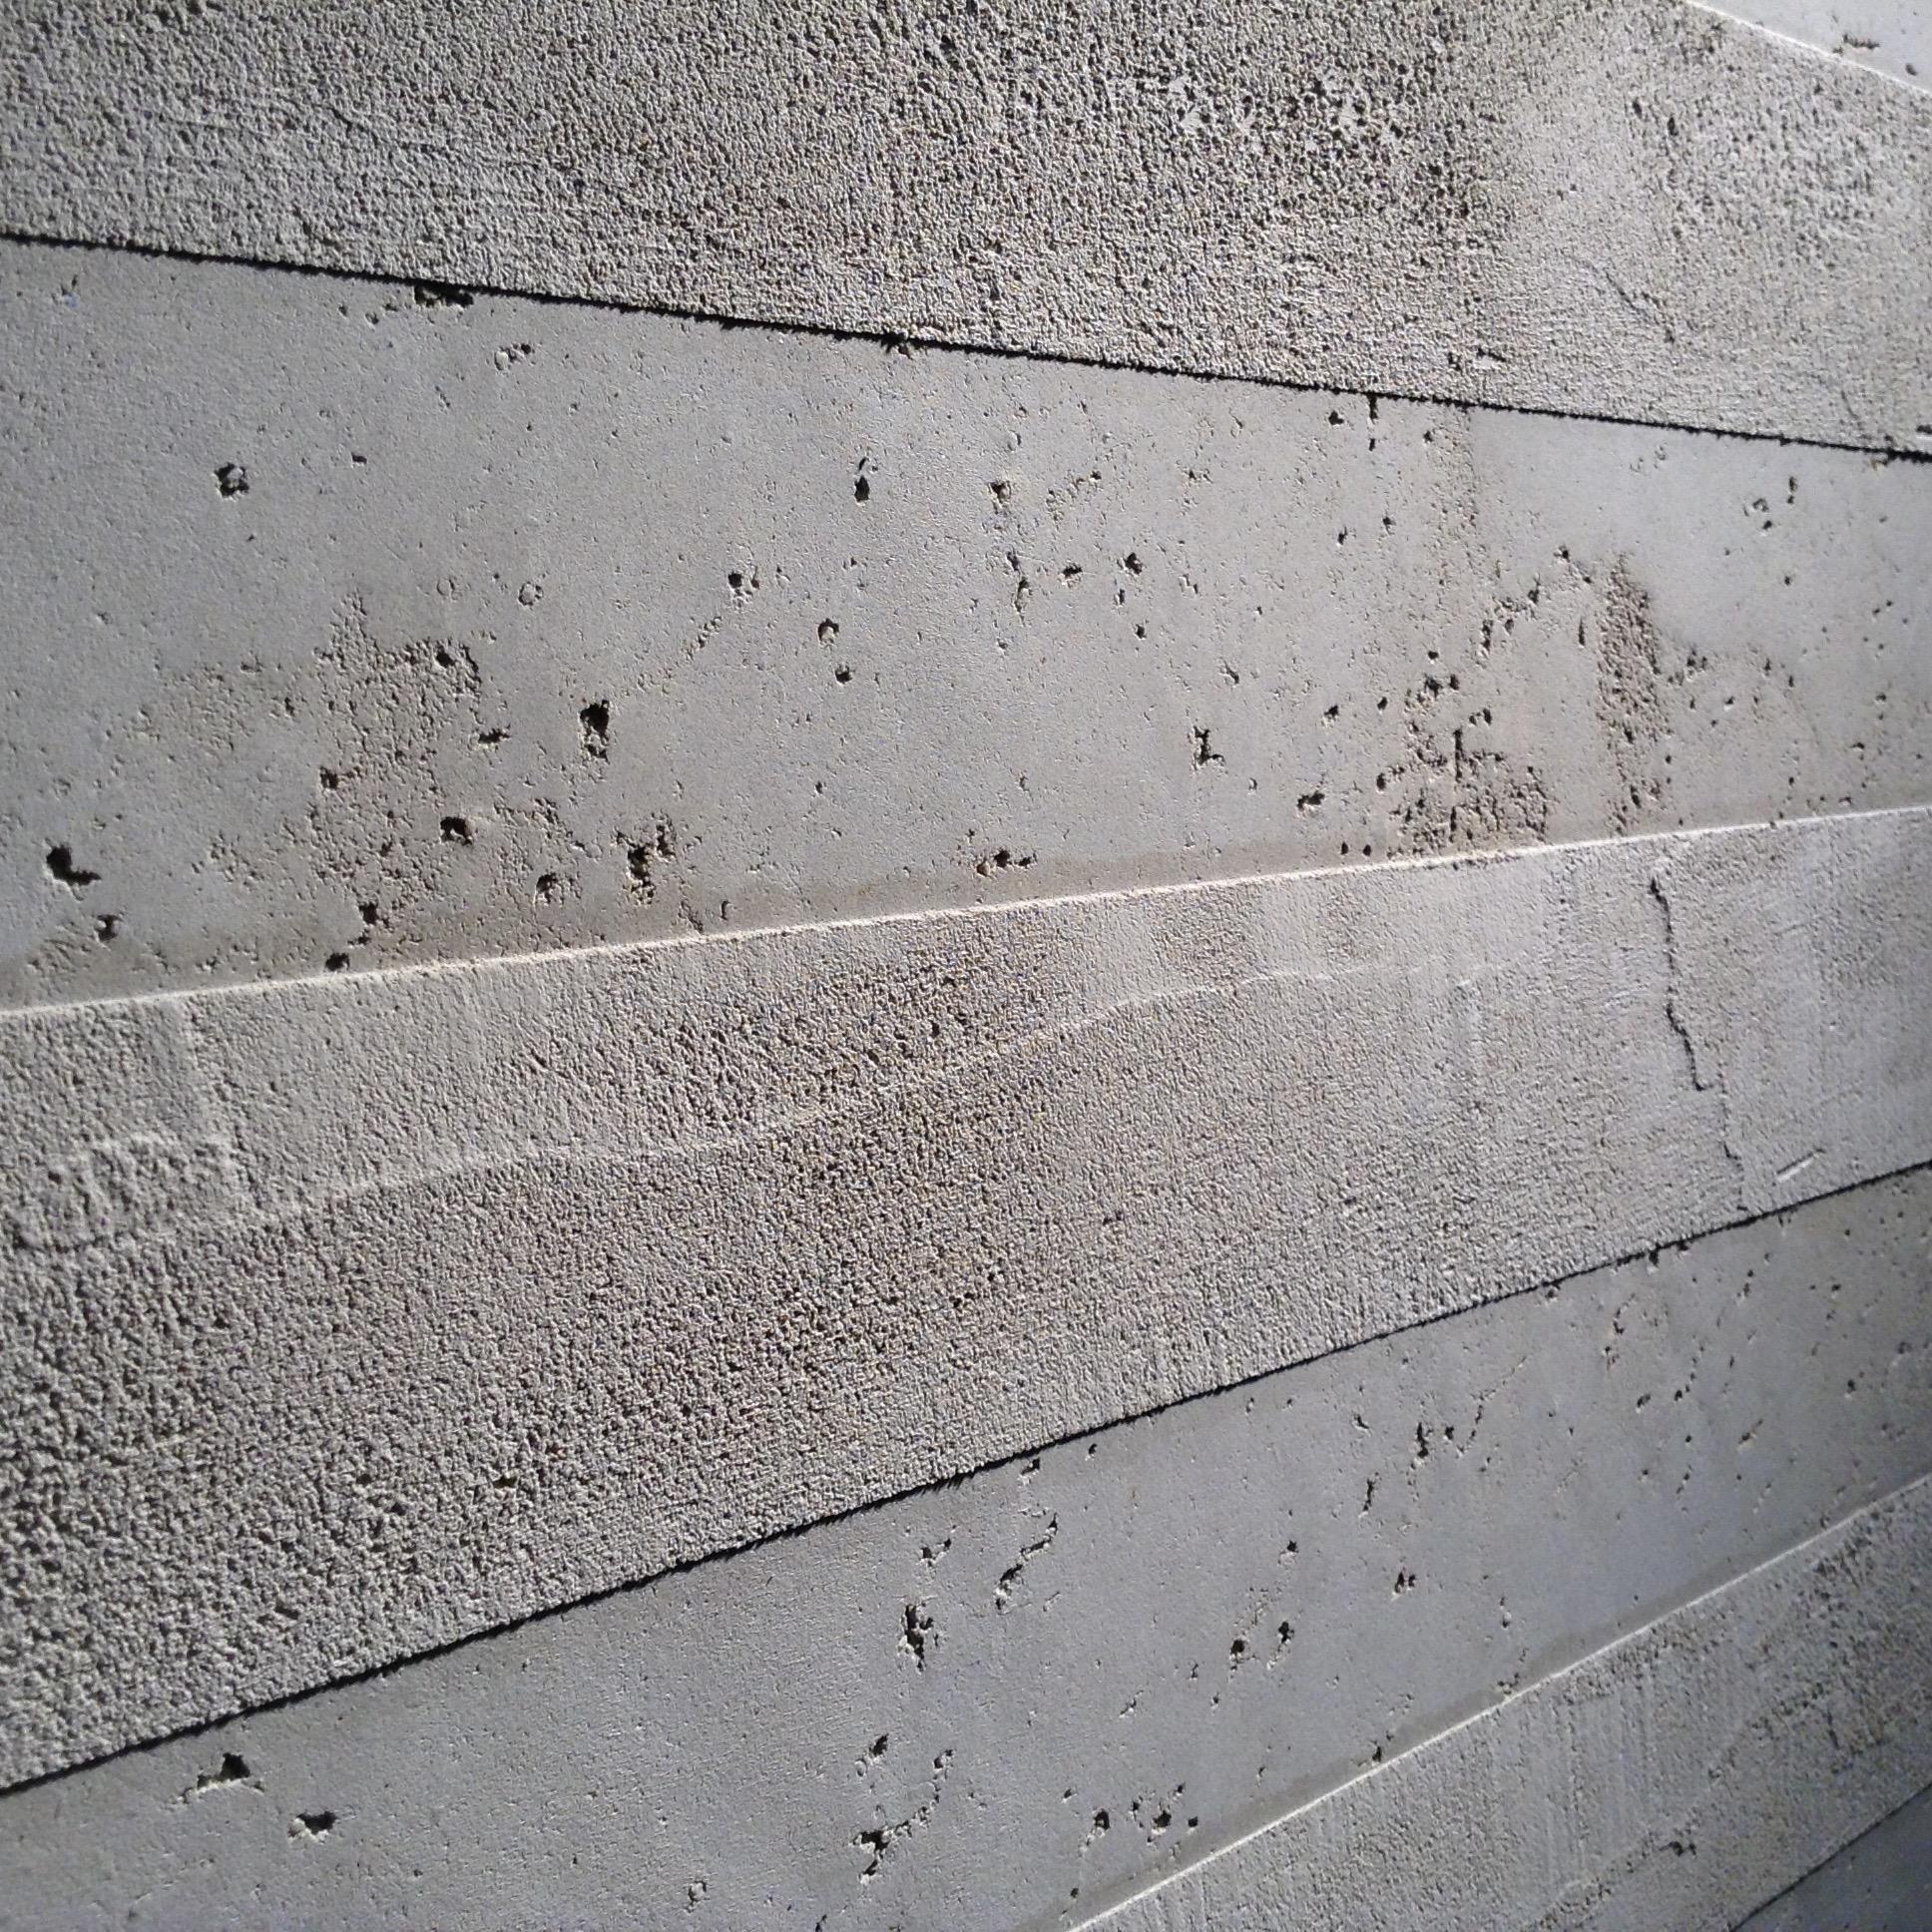 Stripes in faux concrete